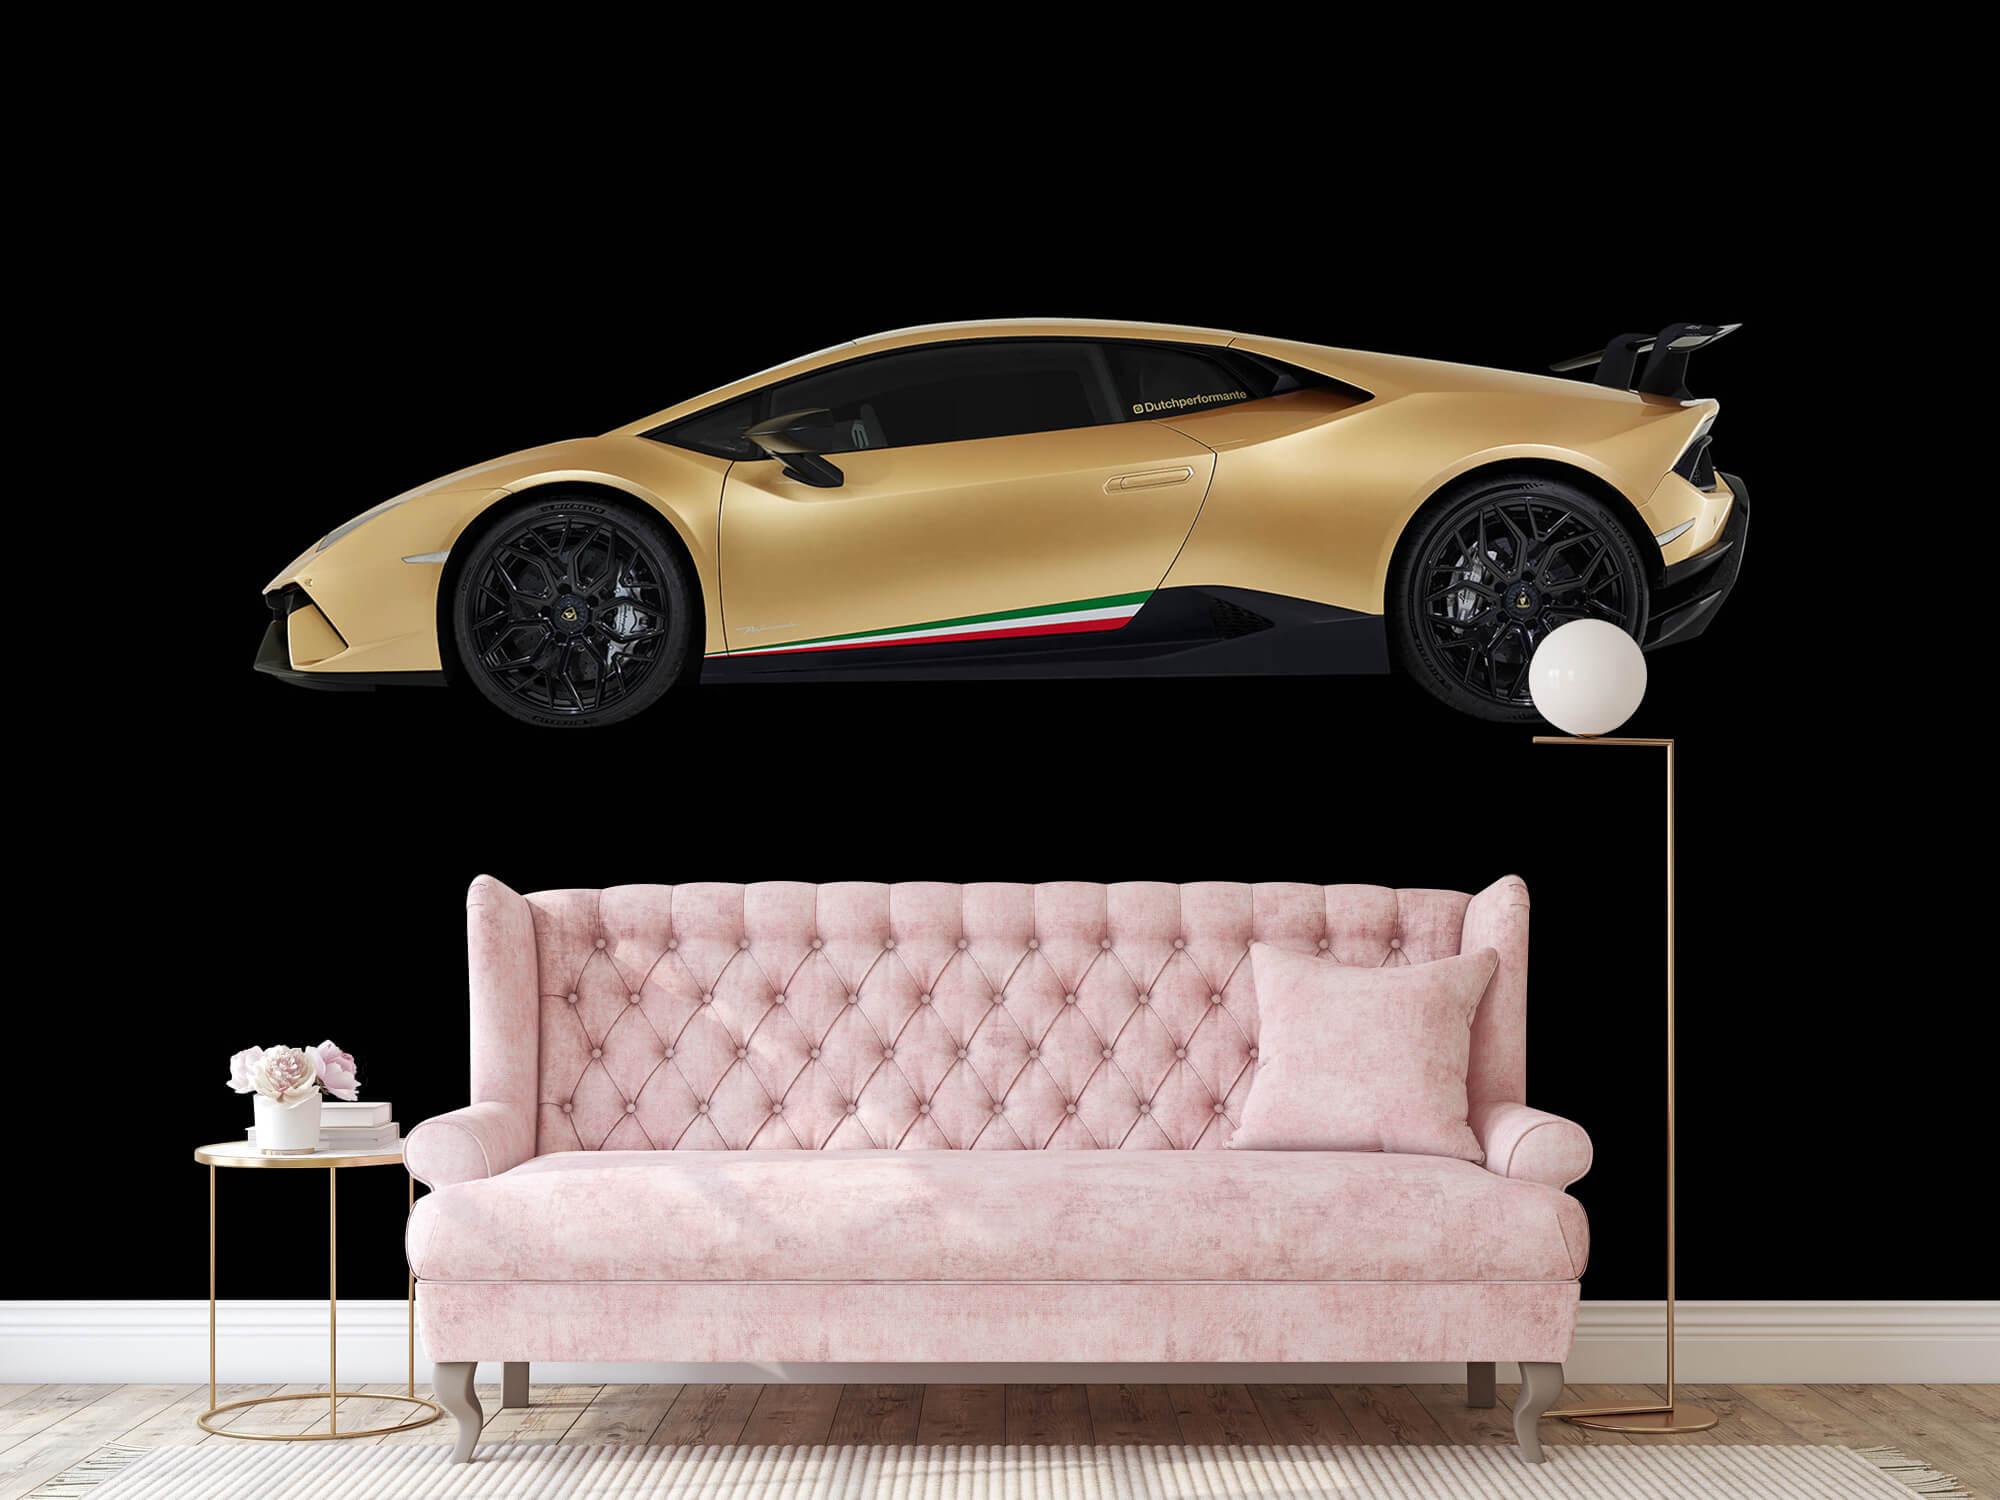 Wallpaper Lamborghini Huracán - Zijkant, zwart 14